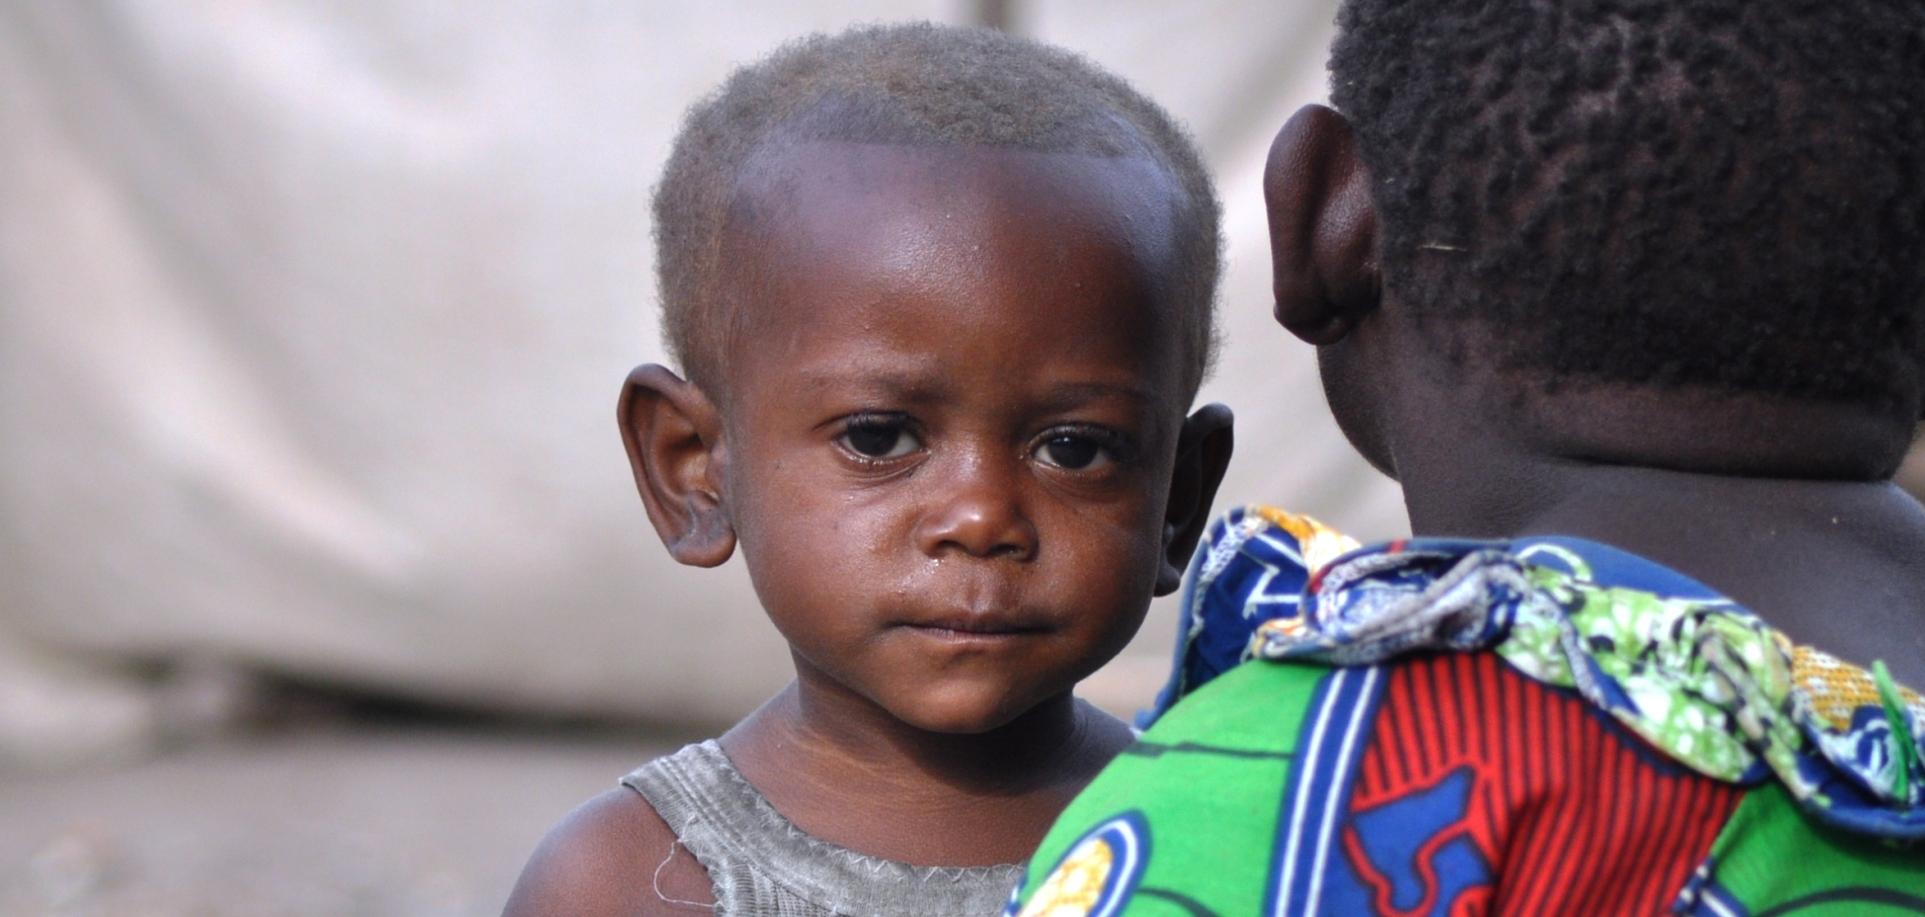 Mbuti Pygmy IQ - Welcome to mbutipygmies.com